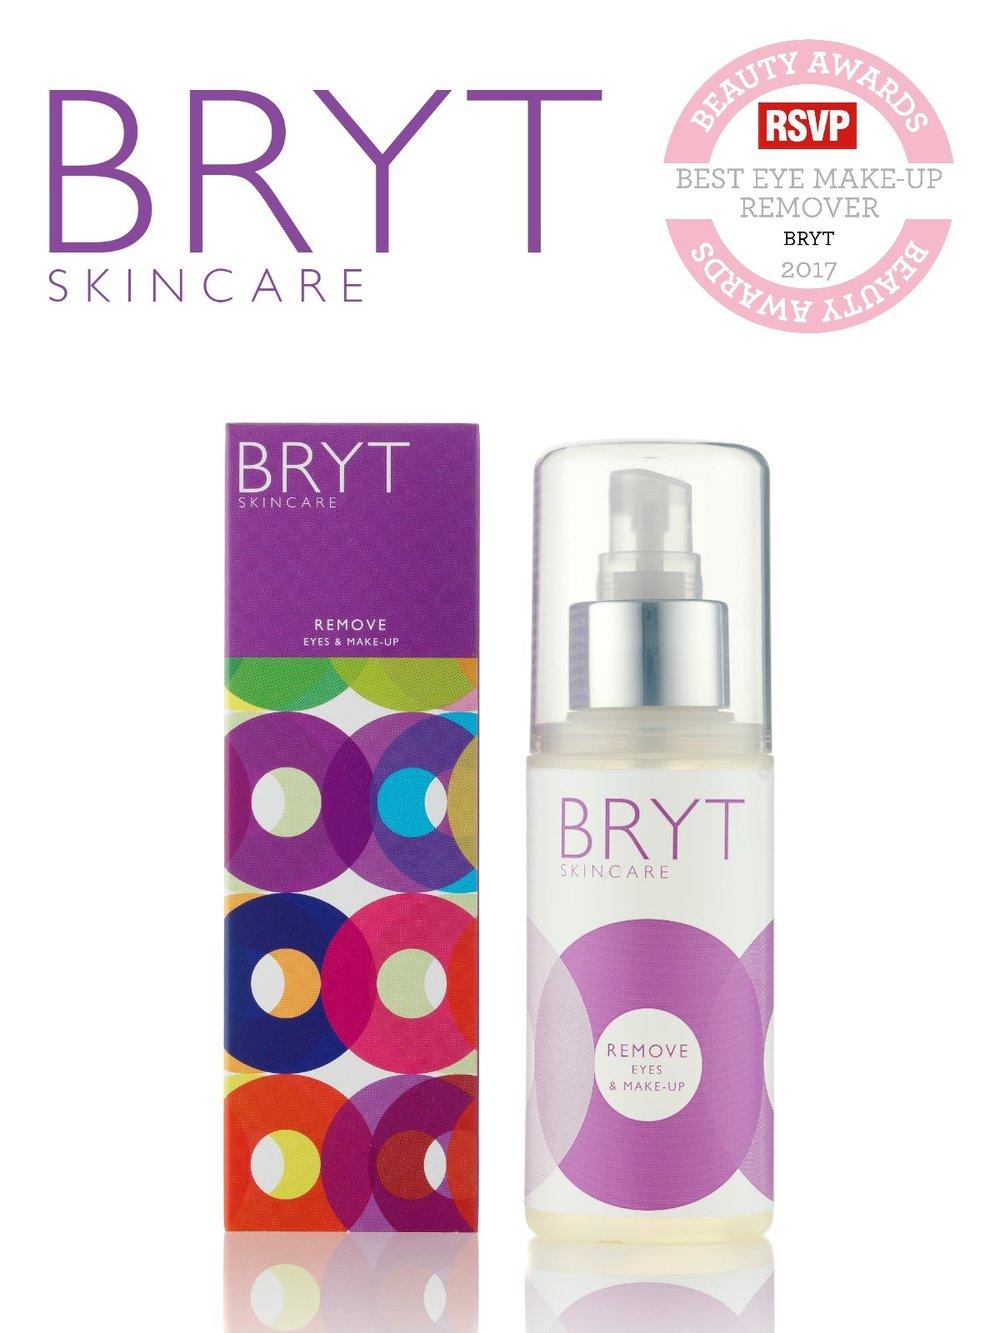 BRYT Remove RSVP Award.jpg